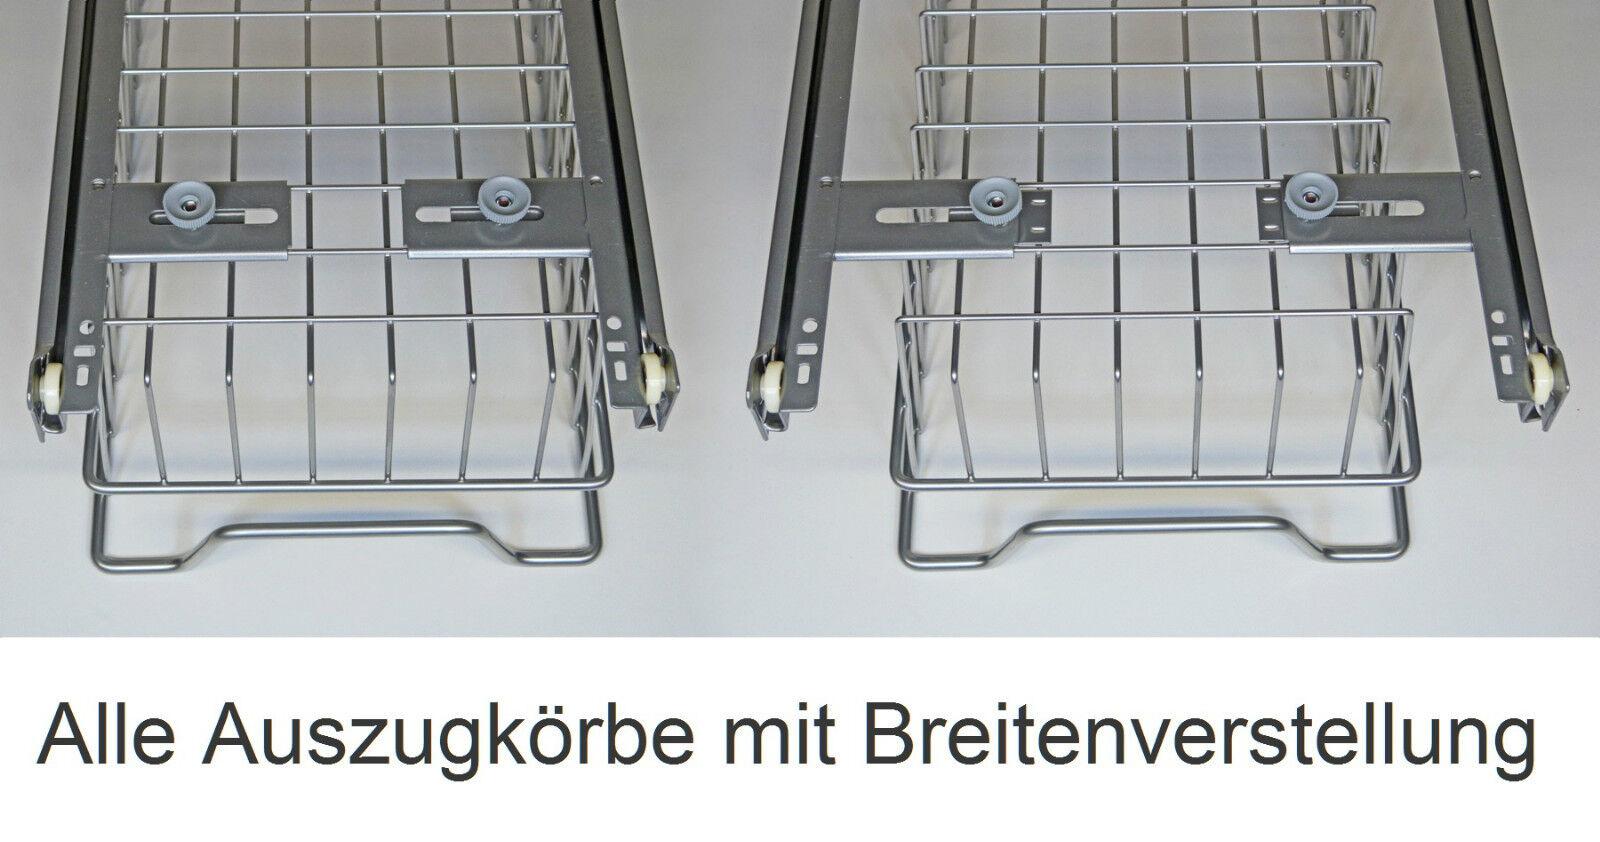 SCHRANKAUSZUG TELESKOPSCHUBLADE KORBAUSZUG Drahtkorbauszug Küche ...